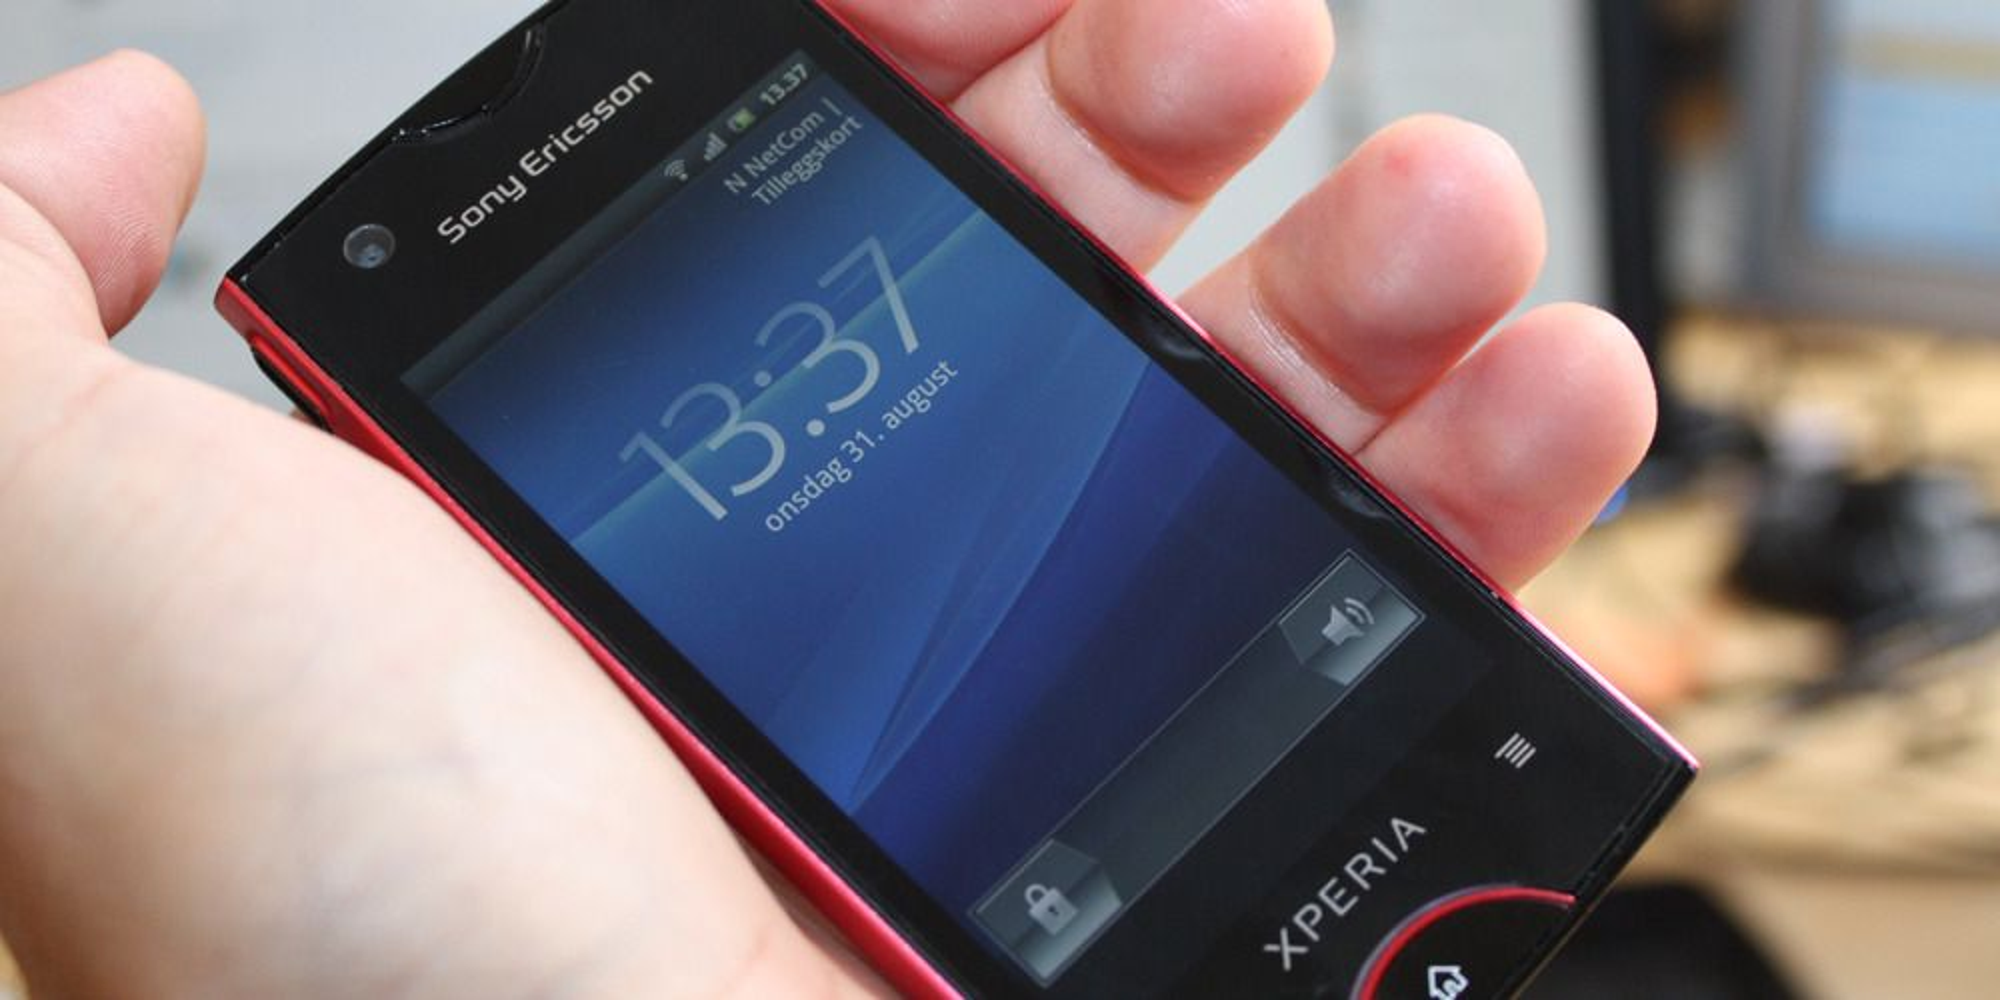 TEST: Test av Sony Ericsson Xperia Ray